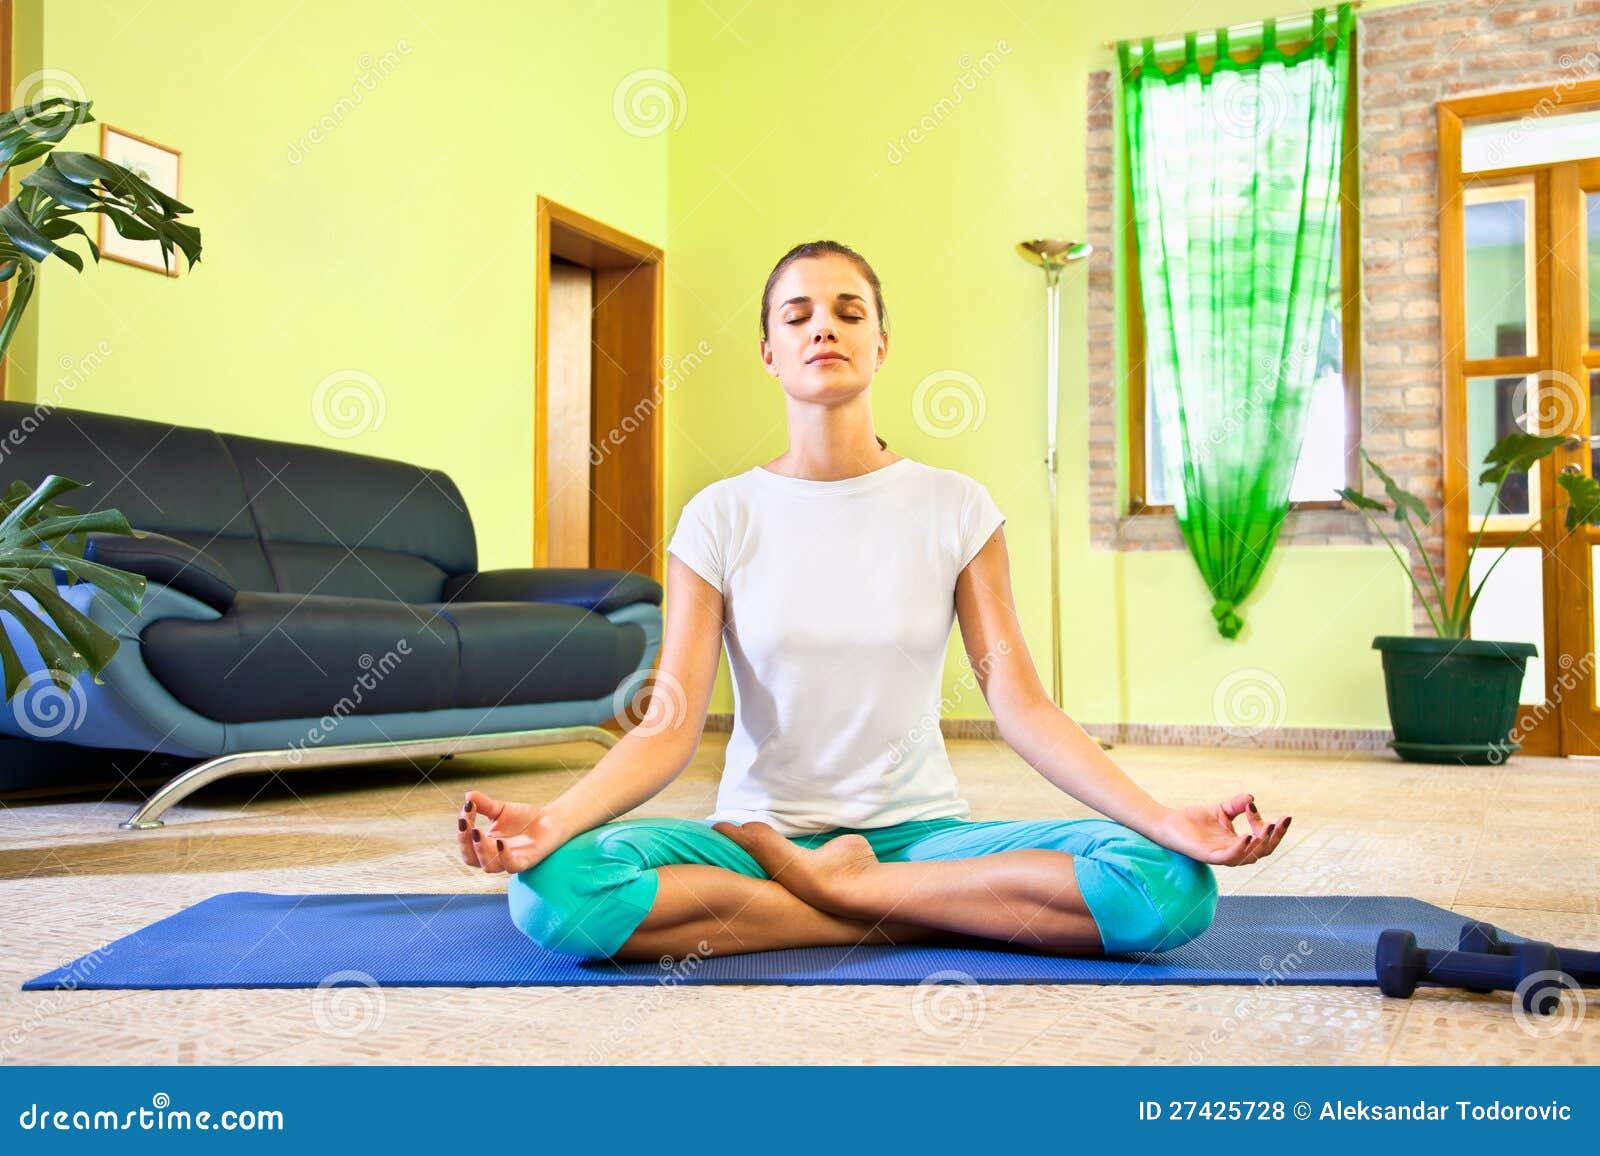 Young beautiful woman has meditation